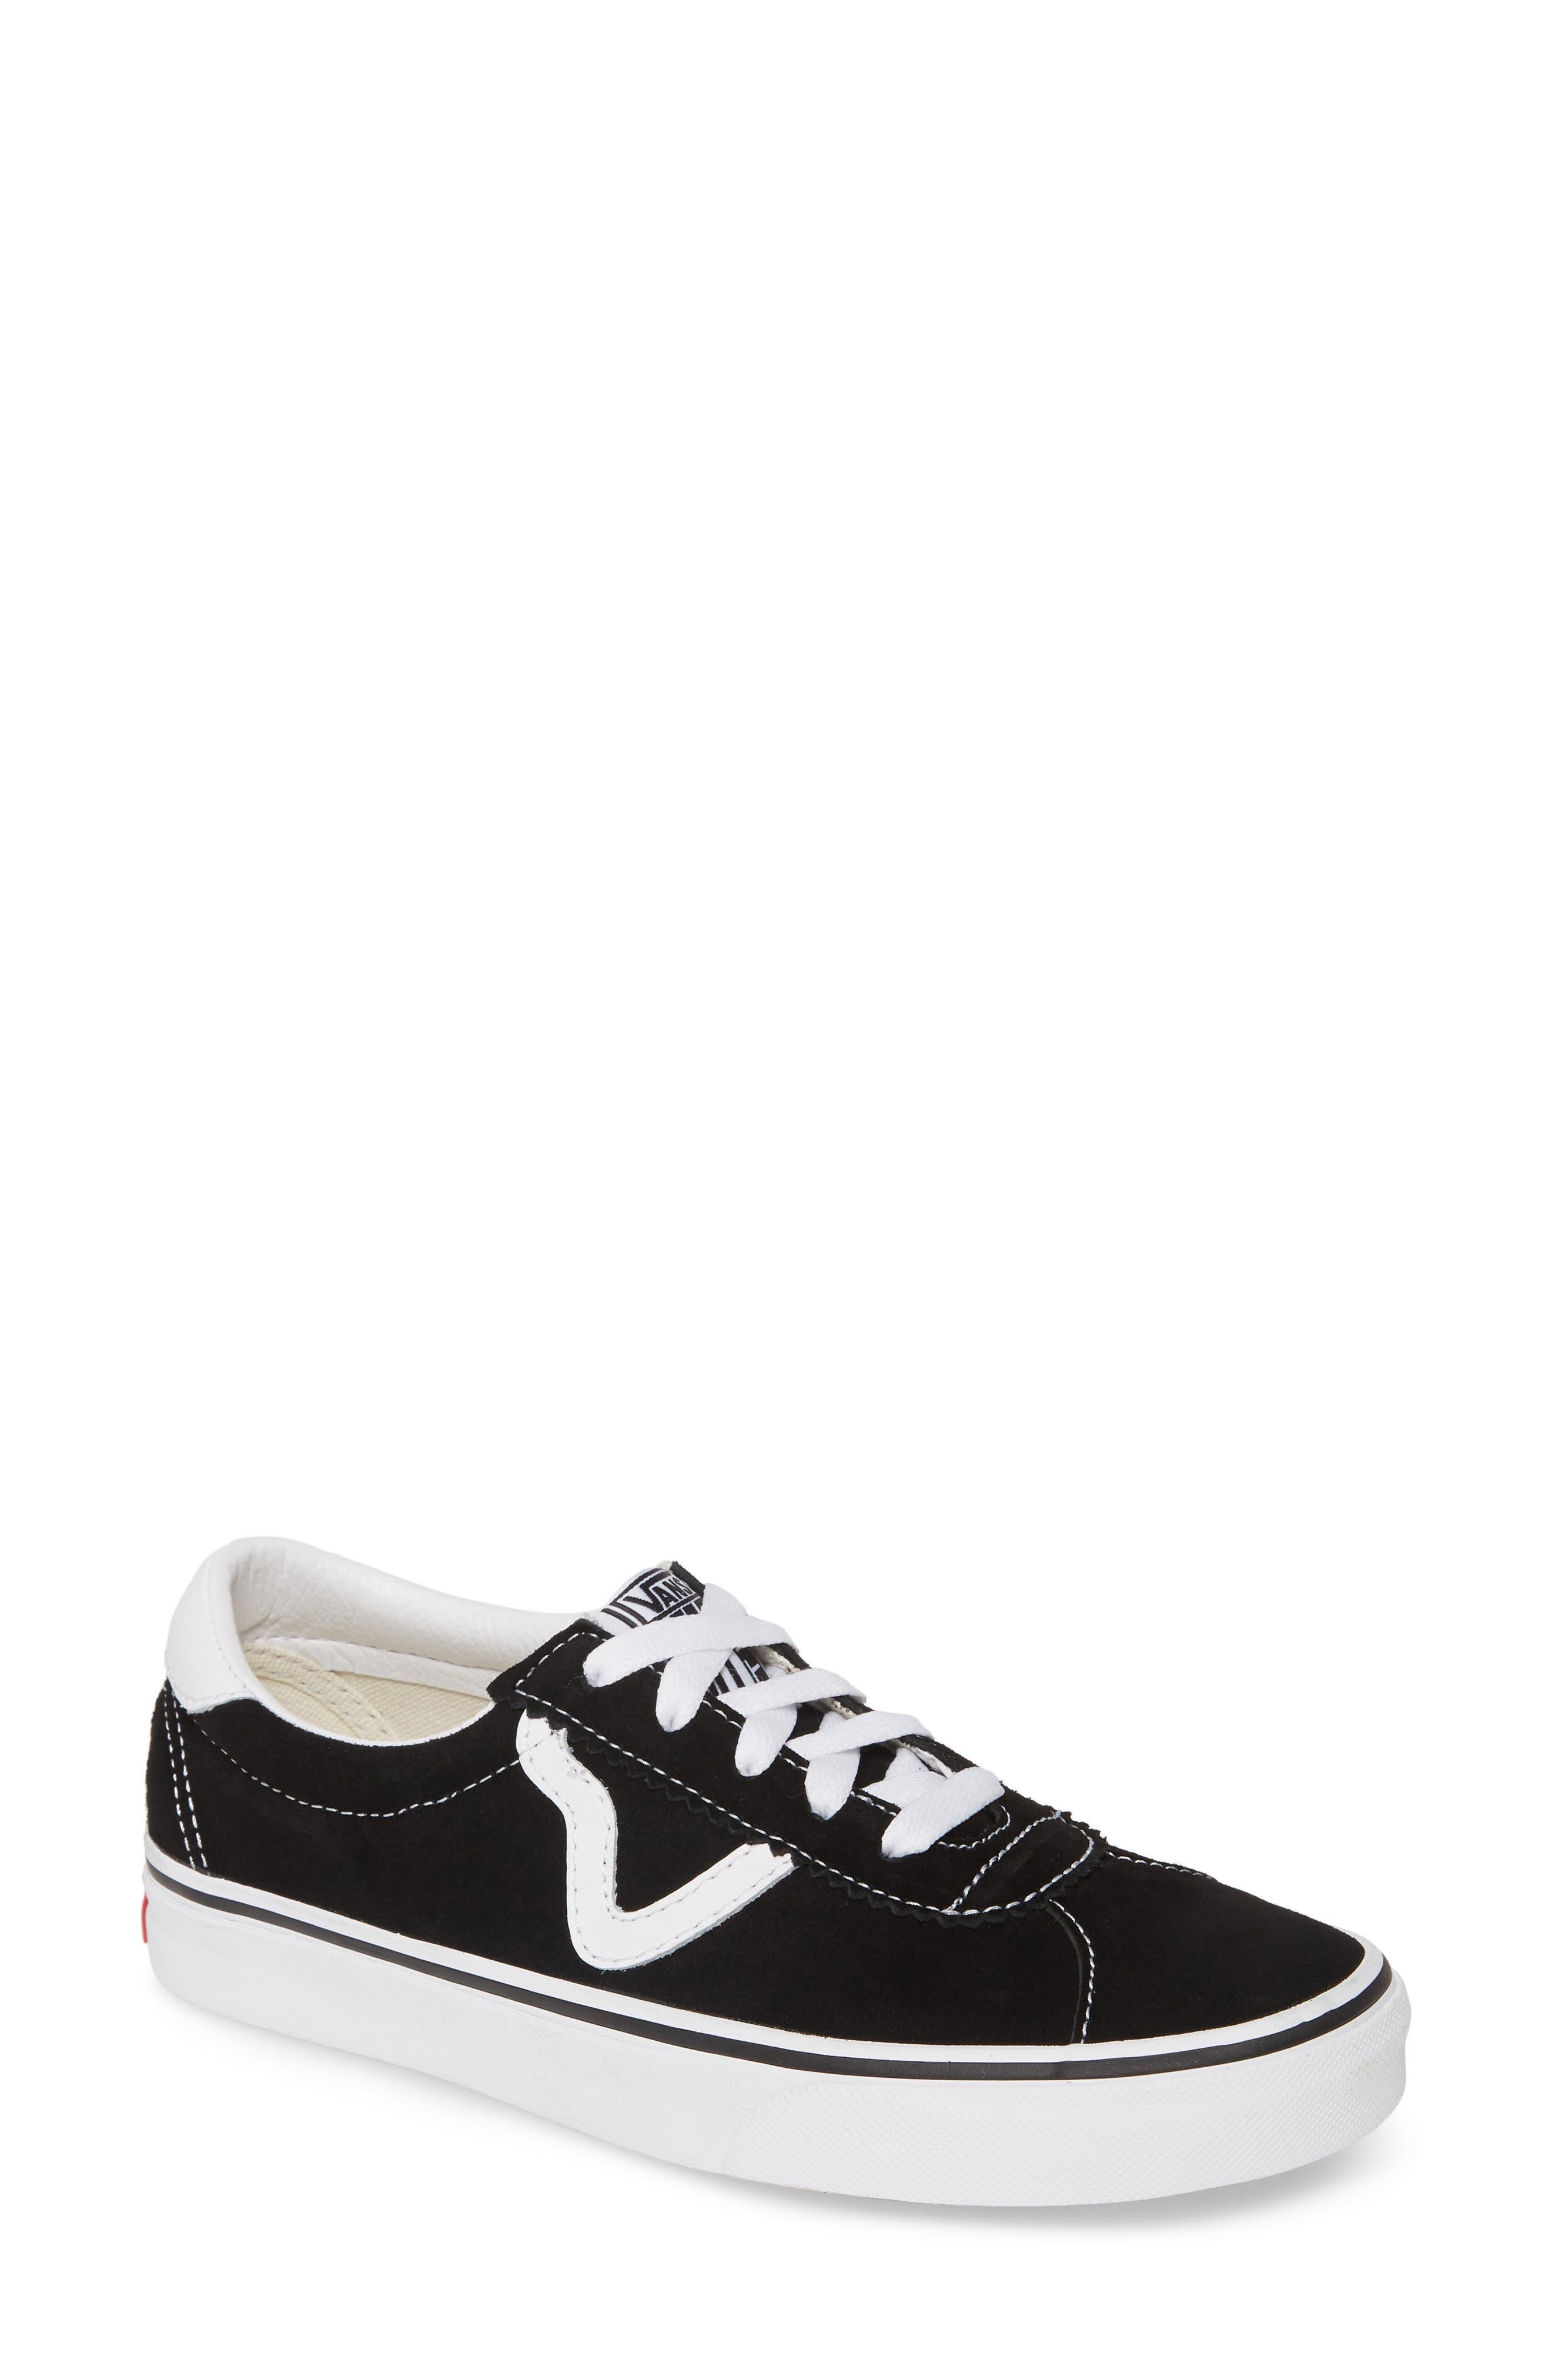 Vans Sport Low Top Sneaker- Black